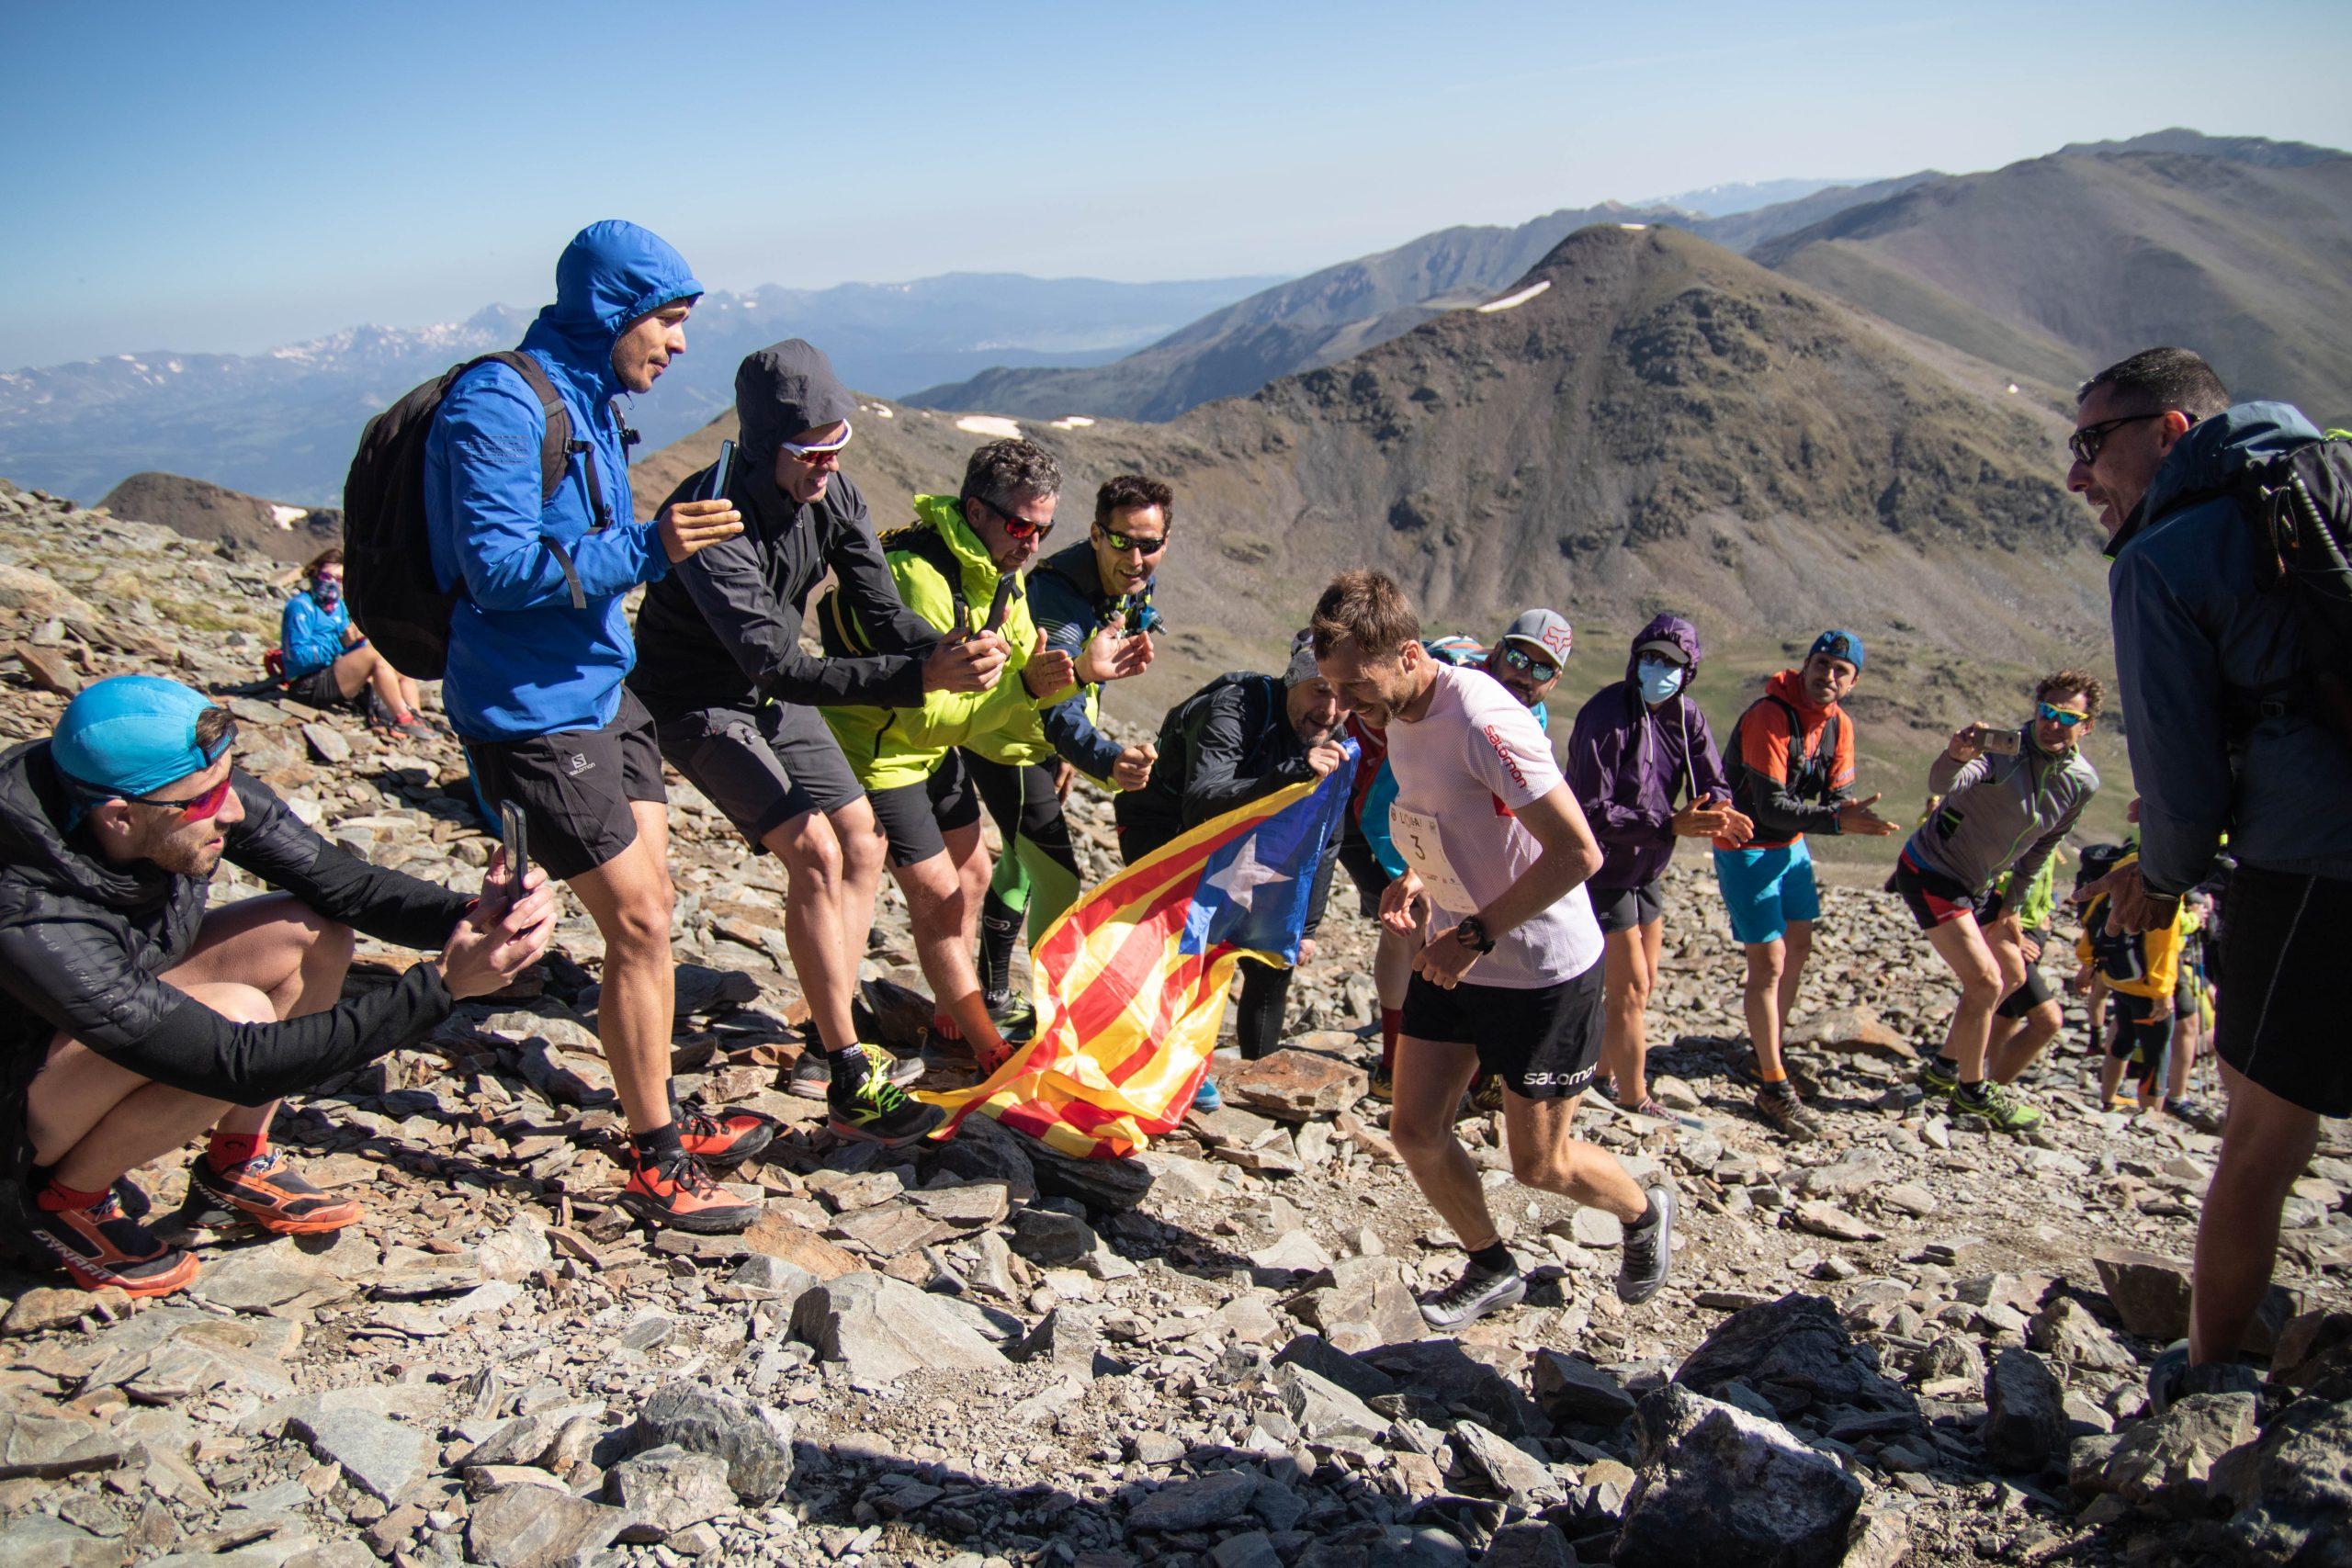 Stian en la subida al Puigmal en L'Olla de Núria 2021